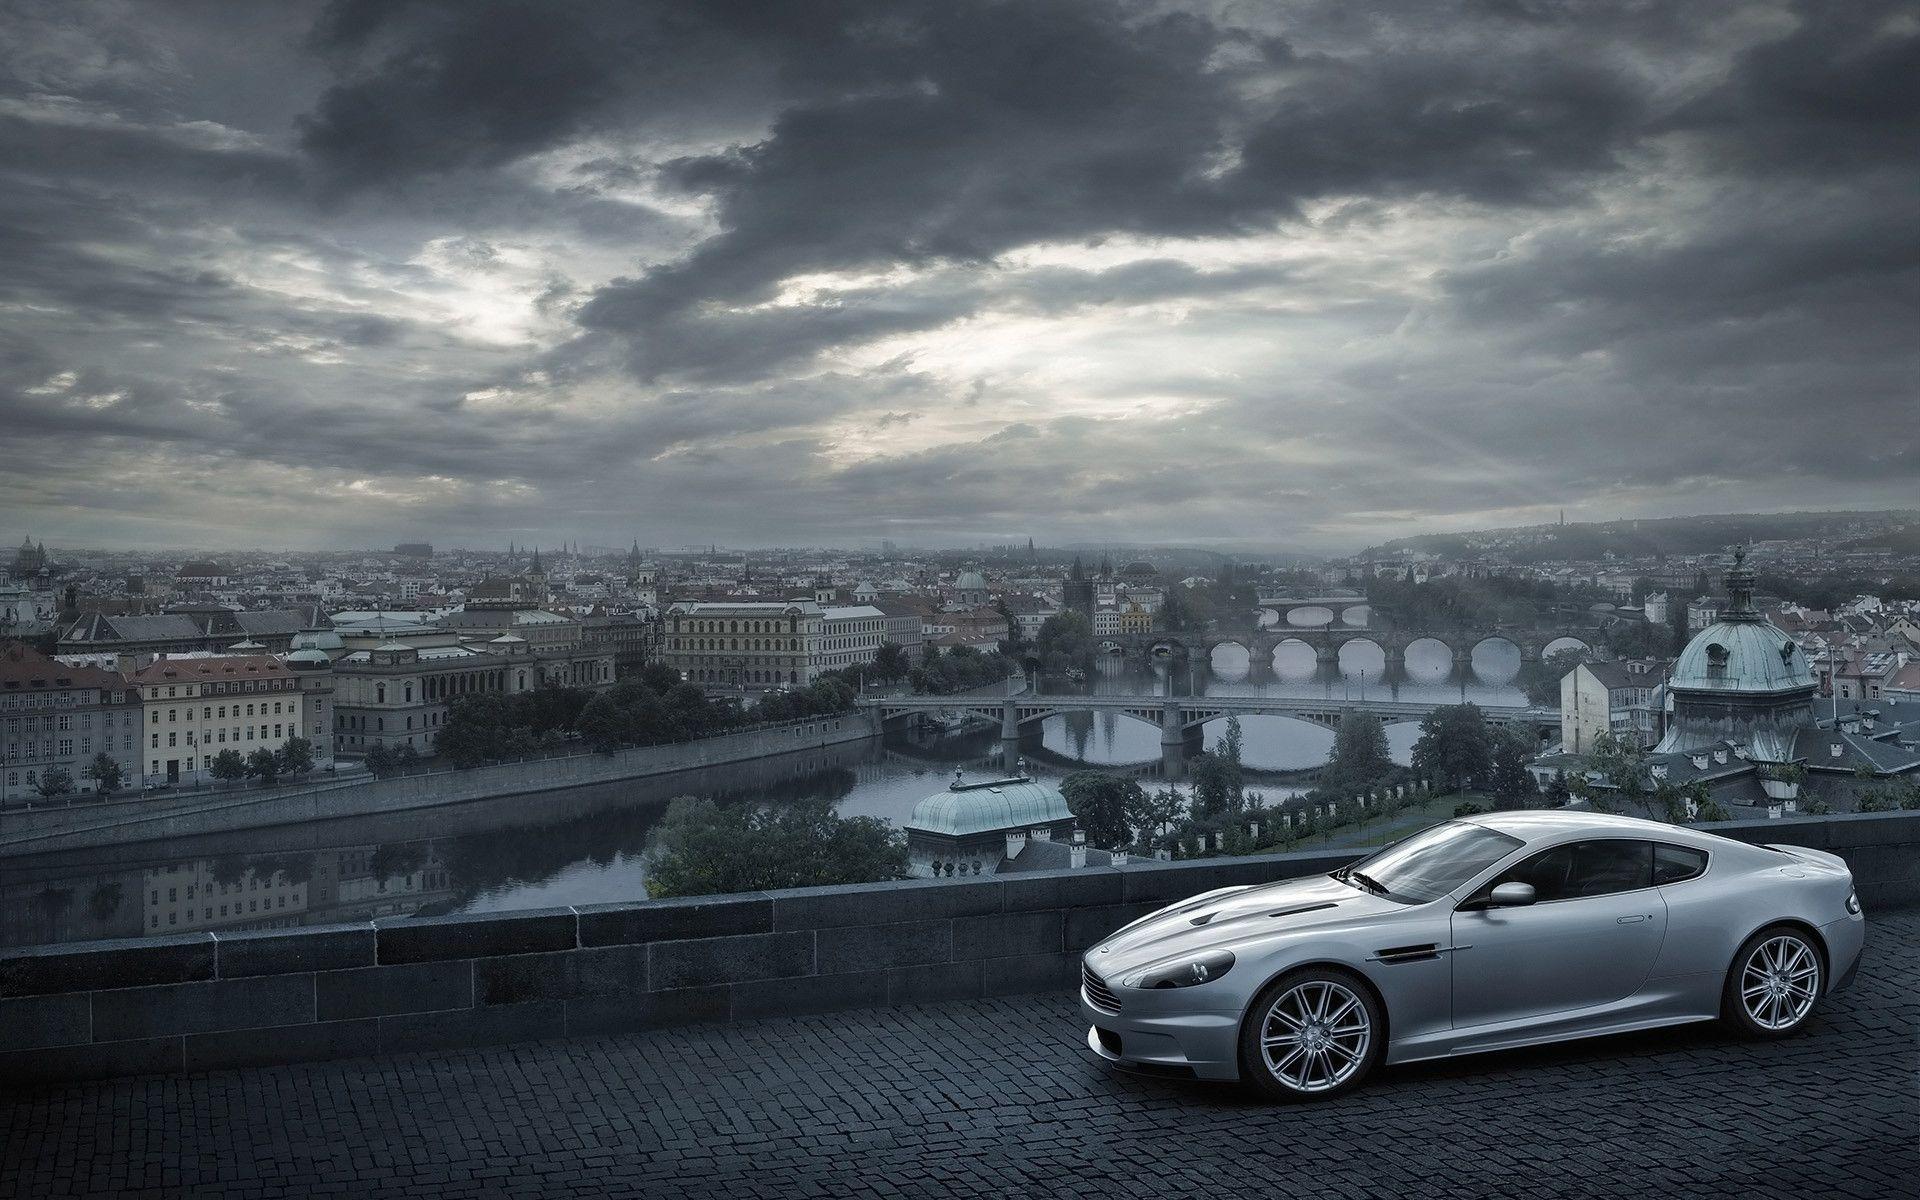 Aston Martin Dbs Hd Wallpaper